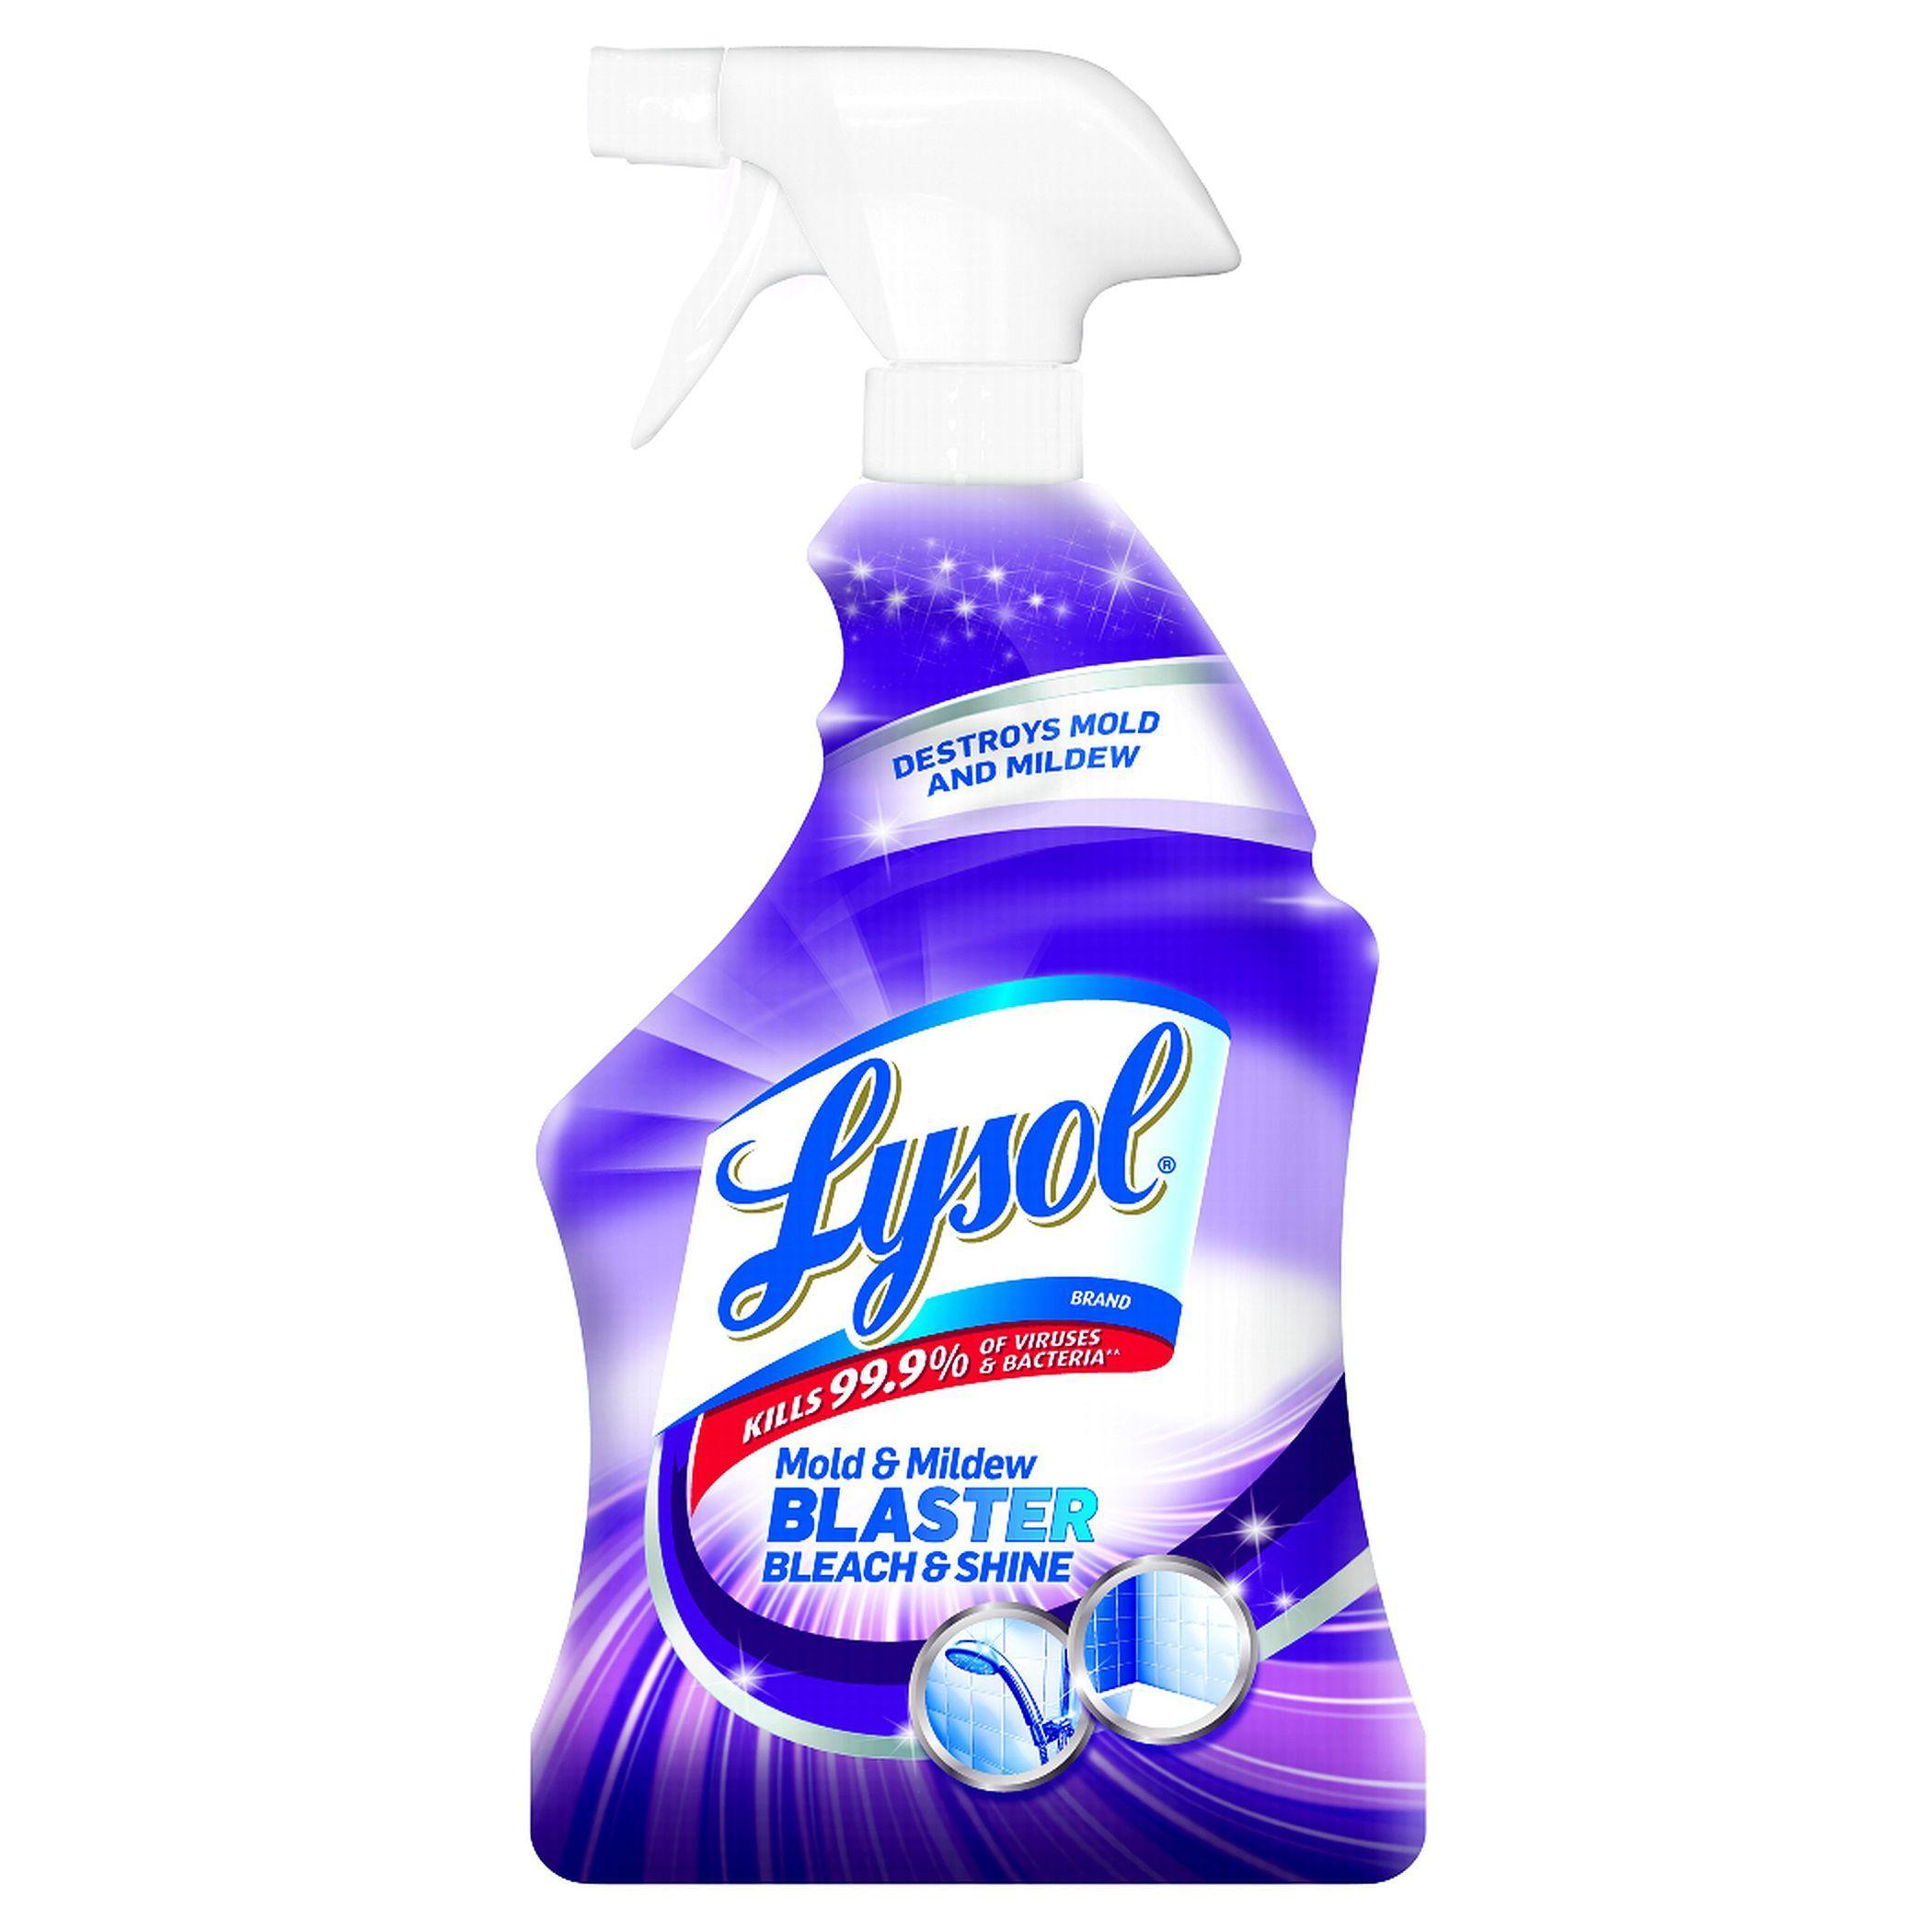 Lysol 78915 32 Oz Mold & Mildew Blaster With Bleach Mold